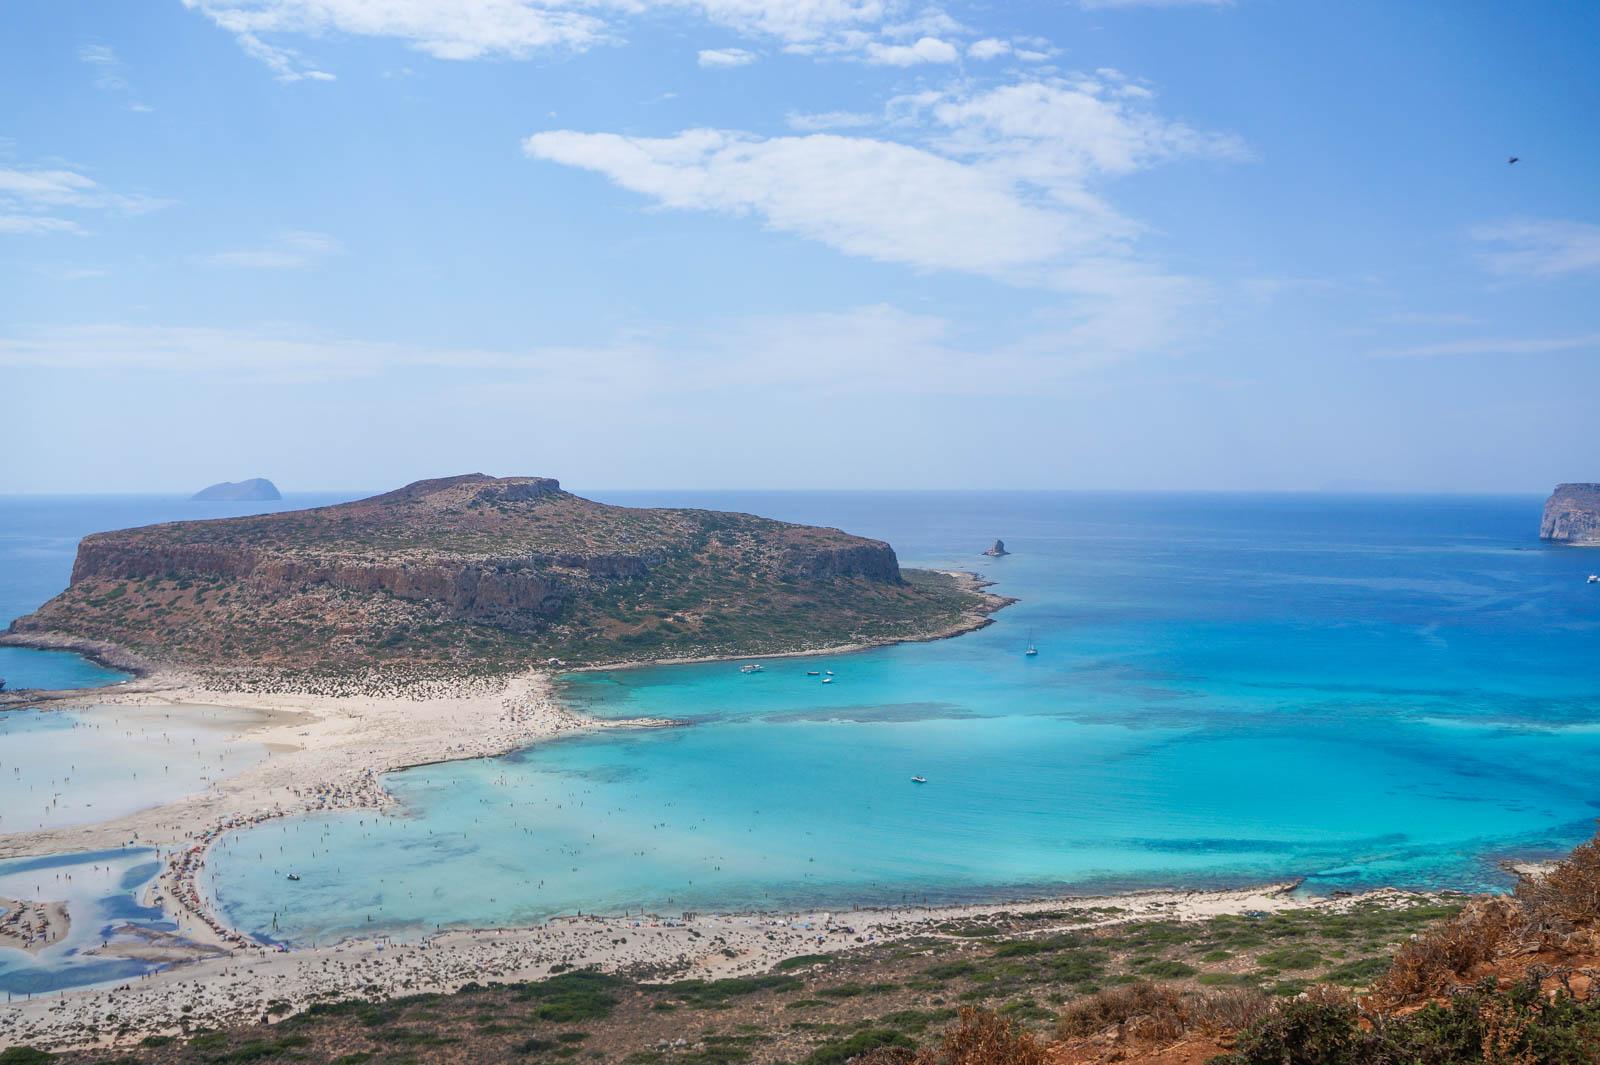 mpalos-beach-crete-greece-la-vie-en-blog-all-rights-reserved-9